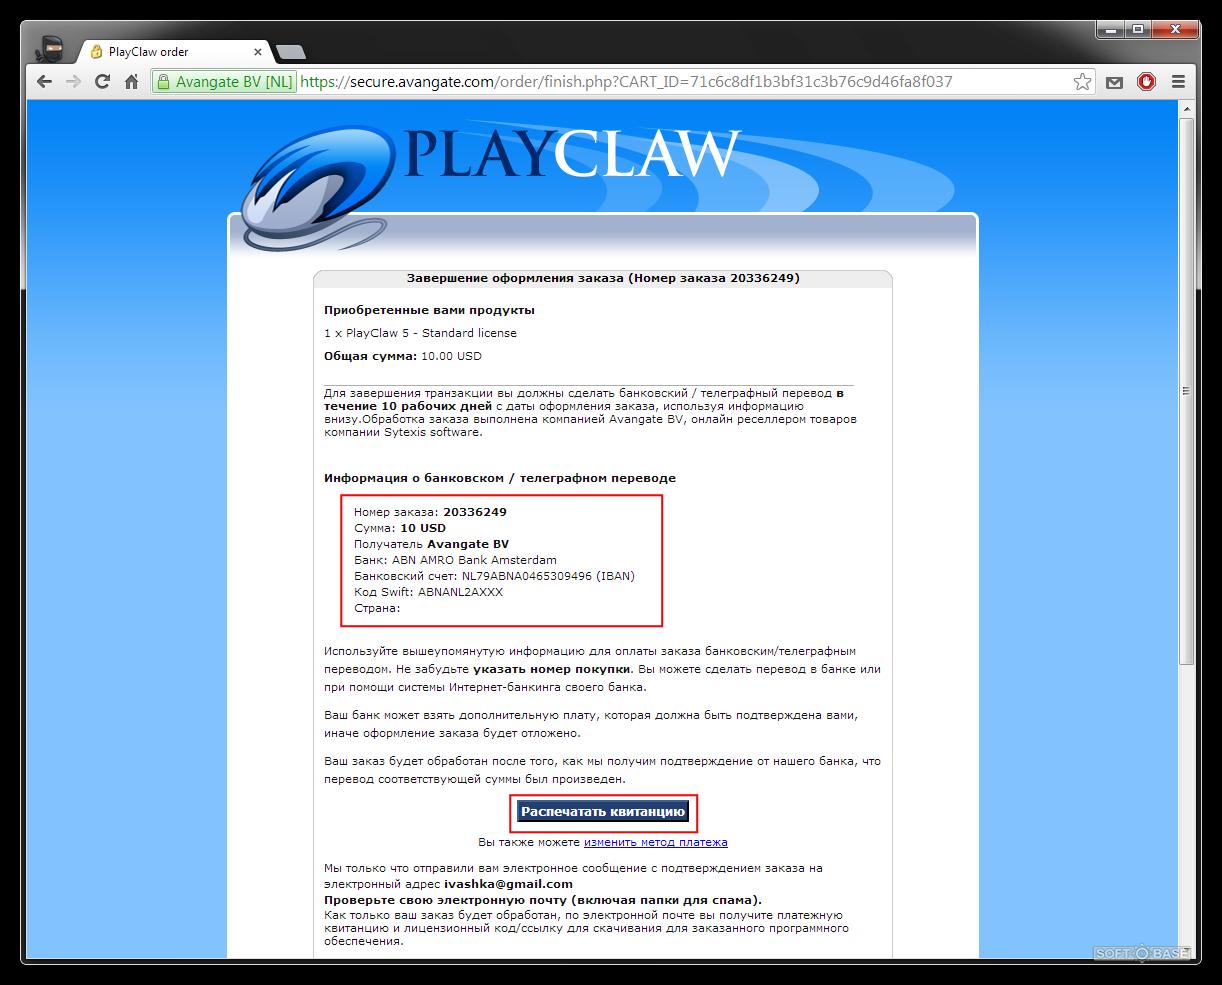 Скачать playclaw 5 на русском c ключом